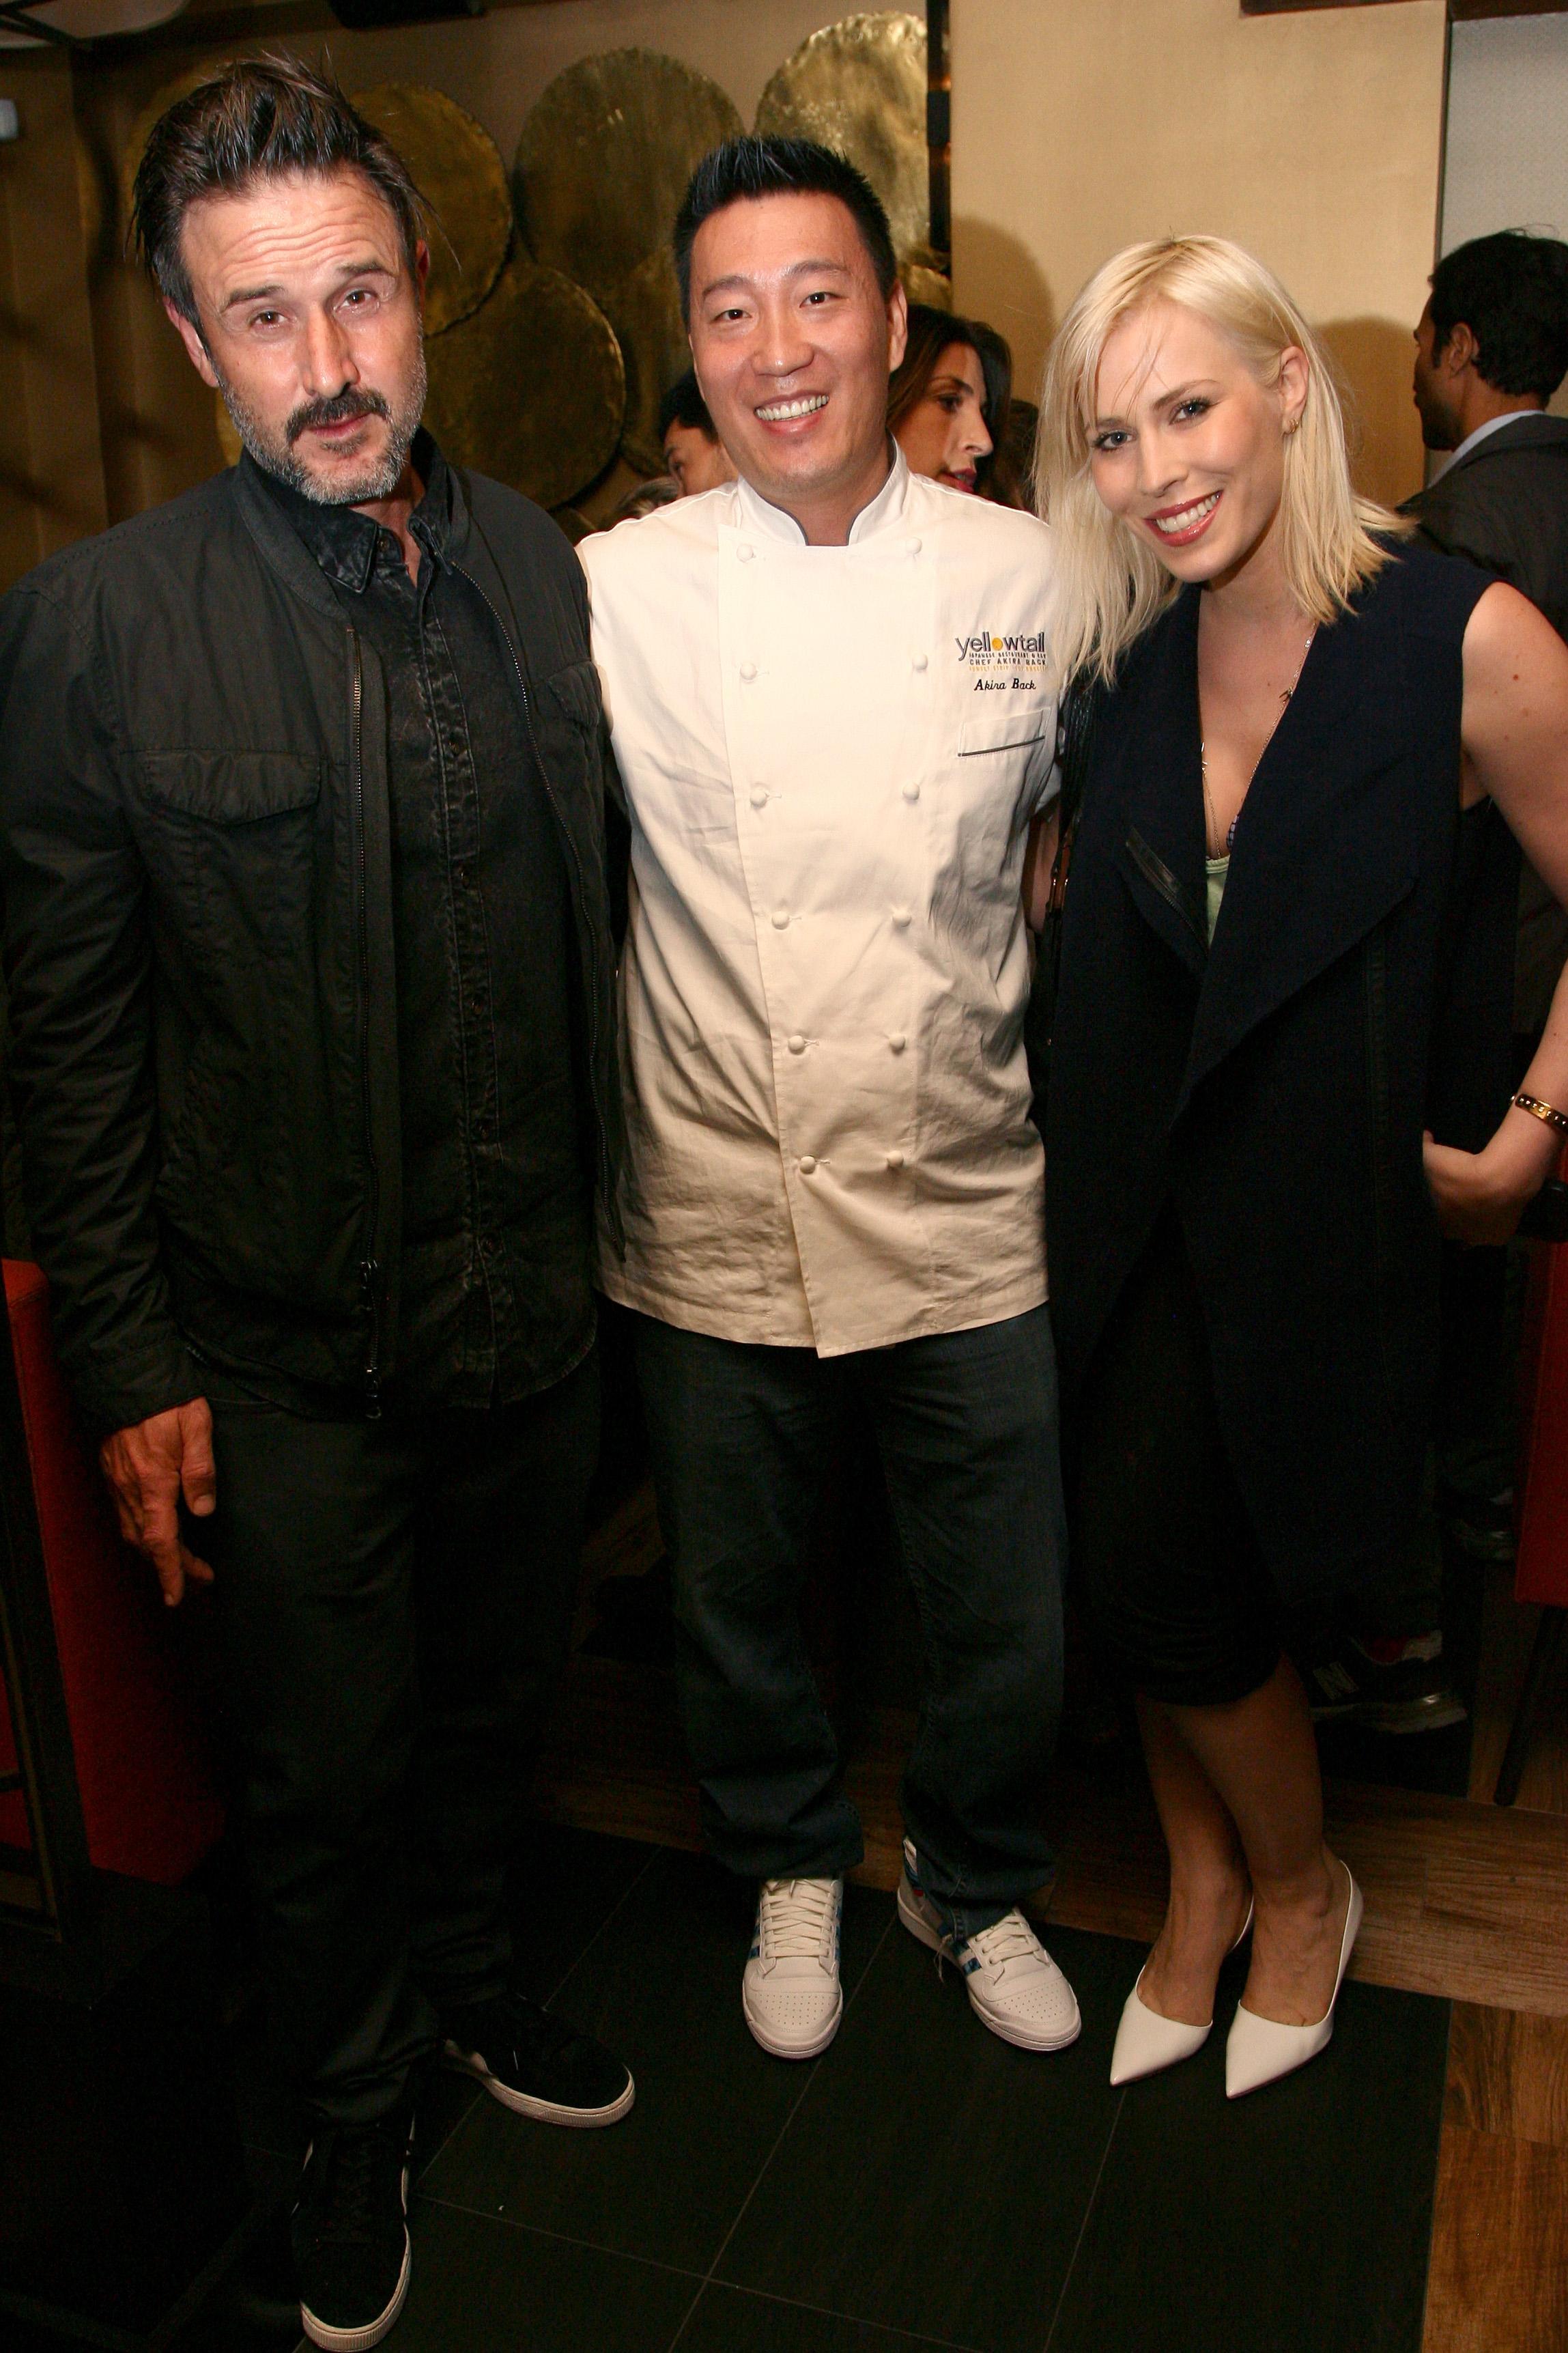 Actor David Arquette, chef Akira Back, and singer Natasha Bedingfield